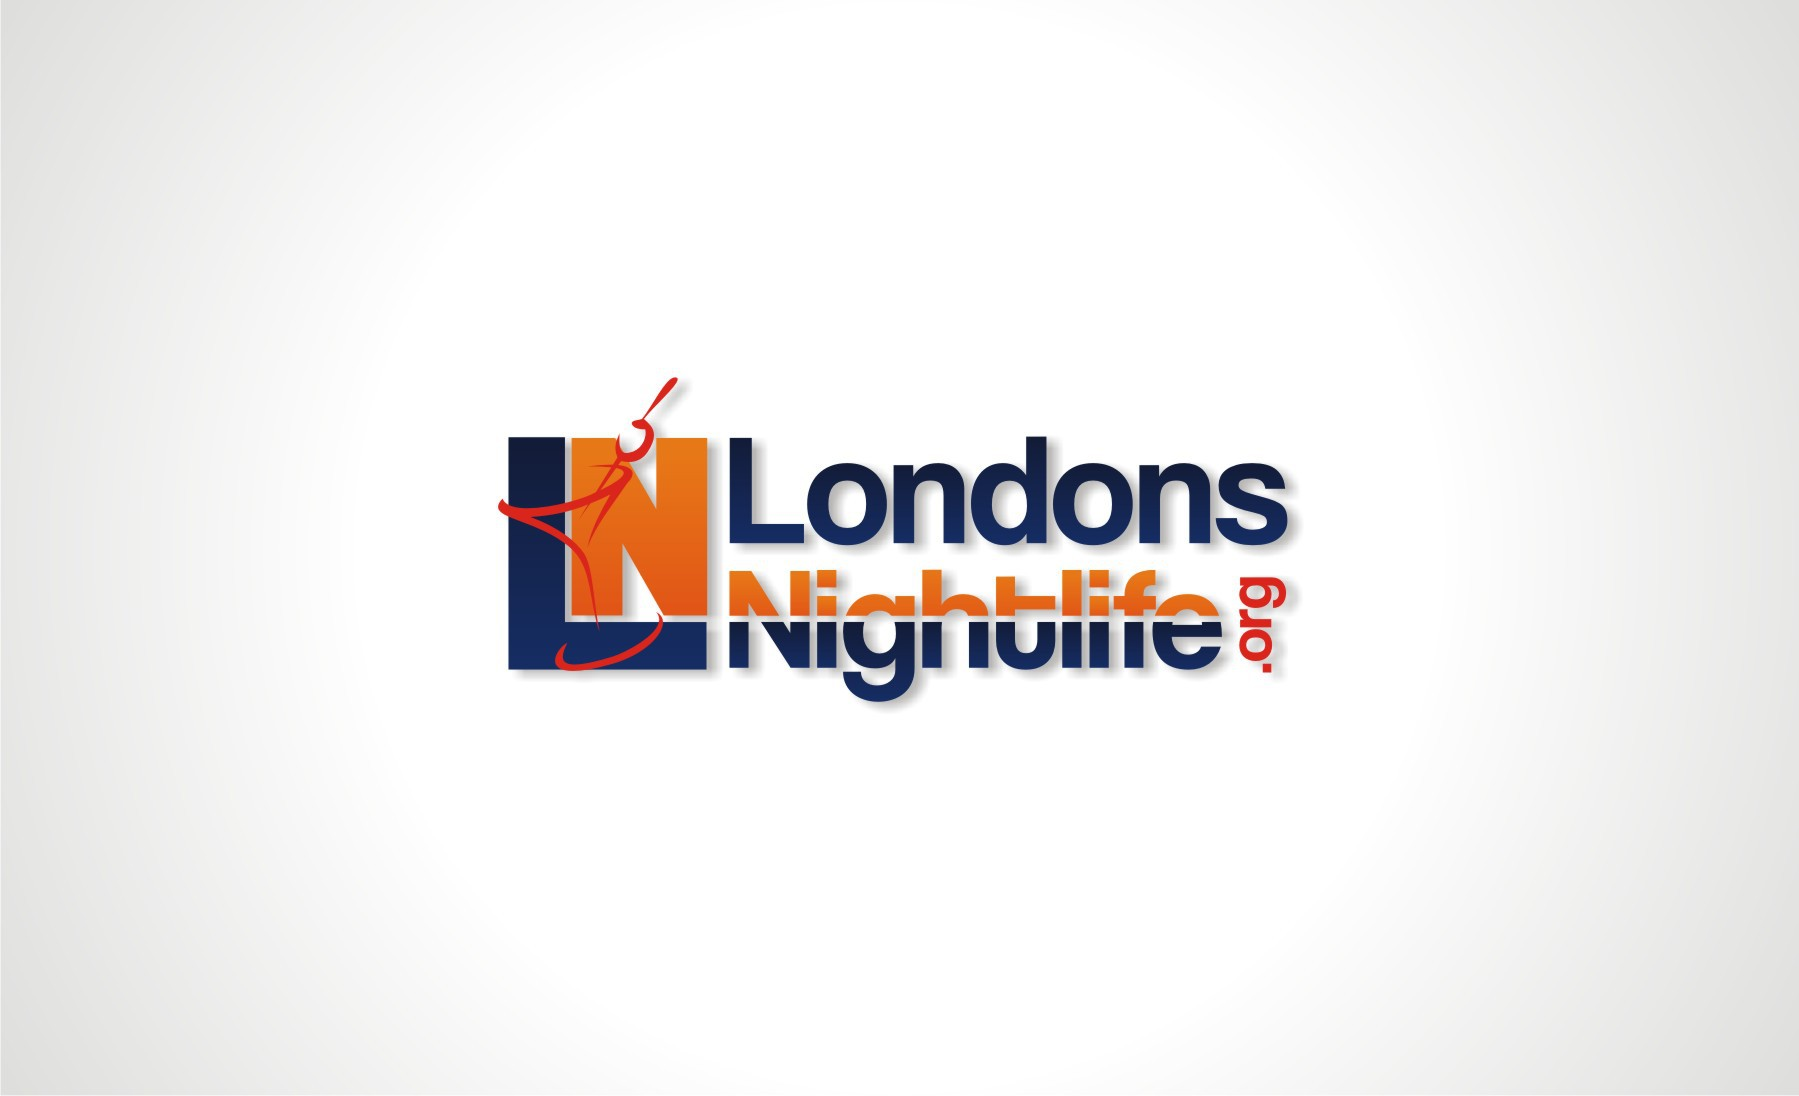 Help Londons Nightlife .org  (londonsnightlife.org) with a new logo